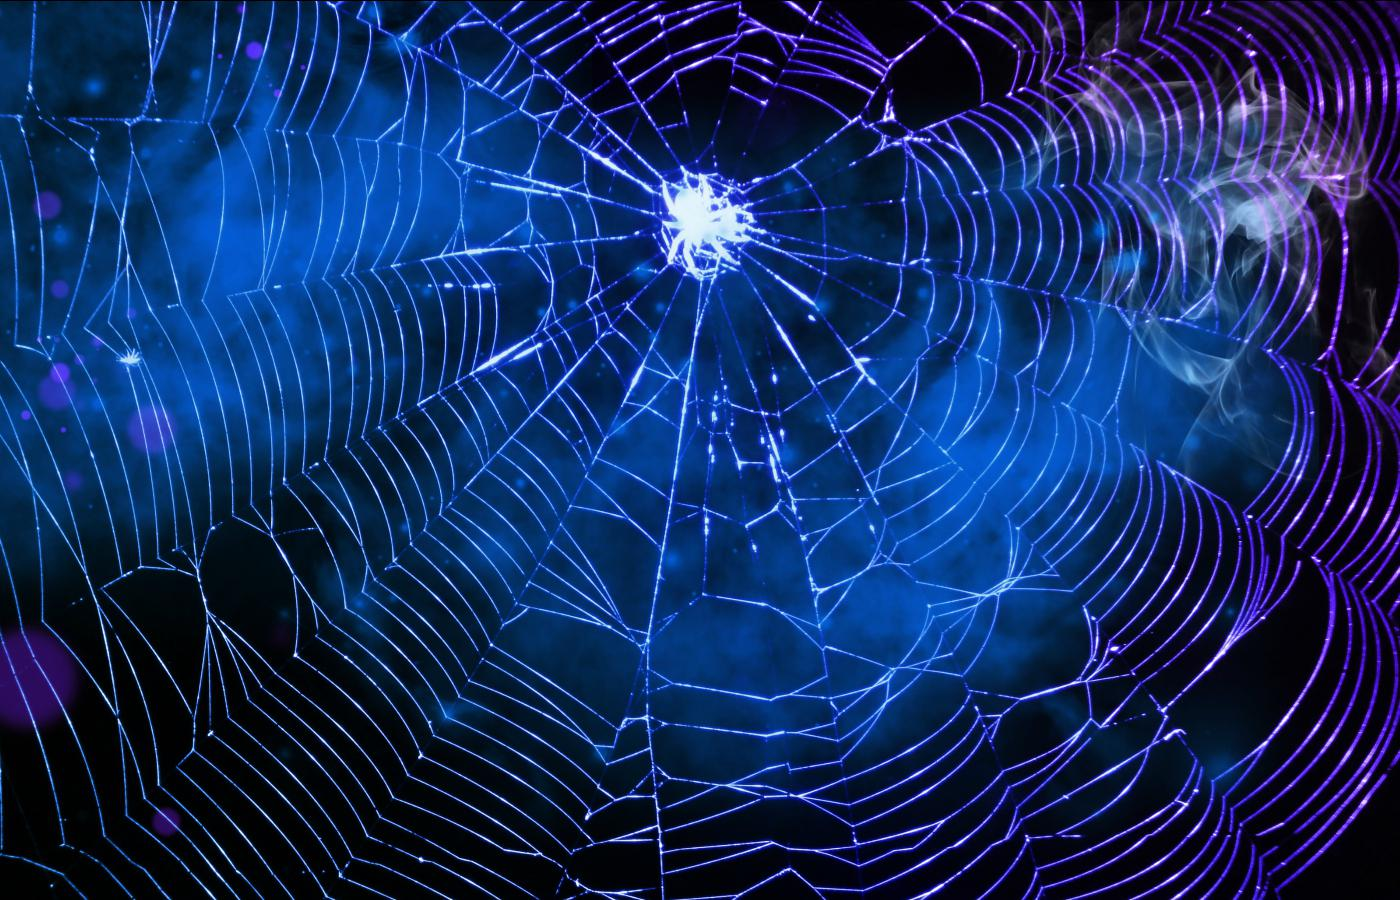 SPIDER S WEB WALLPAPER   138529   HD Wallpapers   [desktopinHQcom] 1400x900